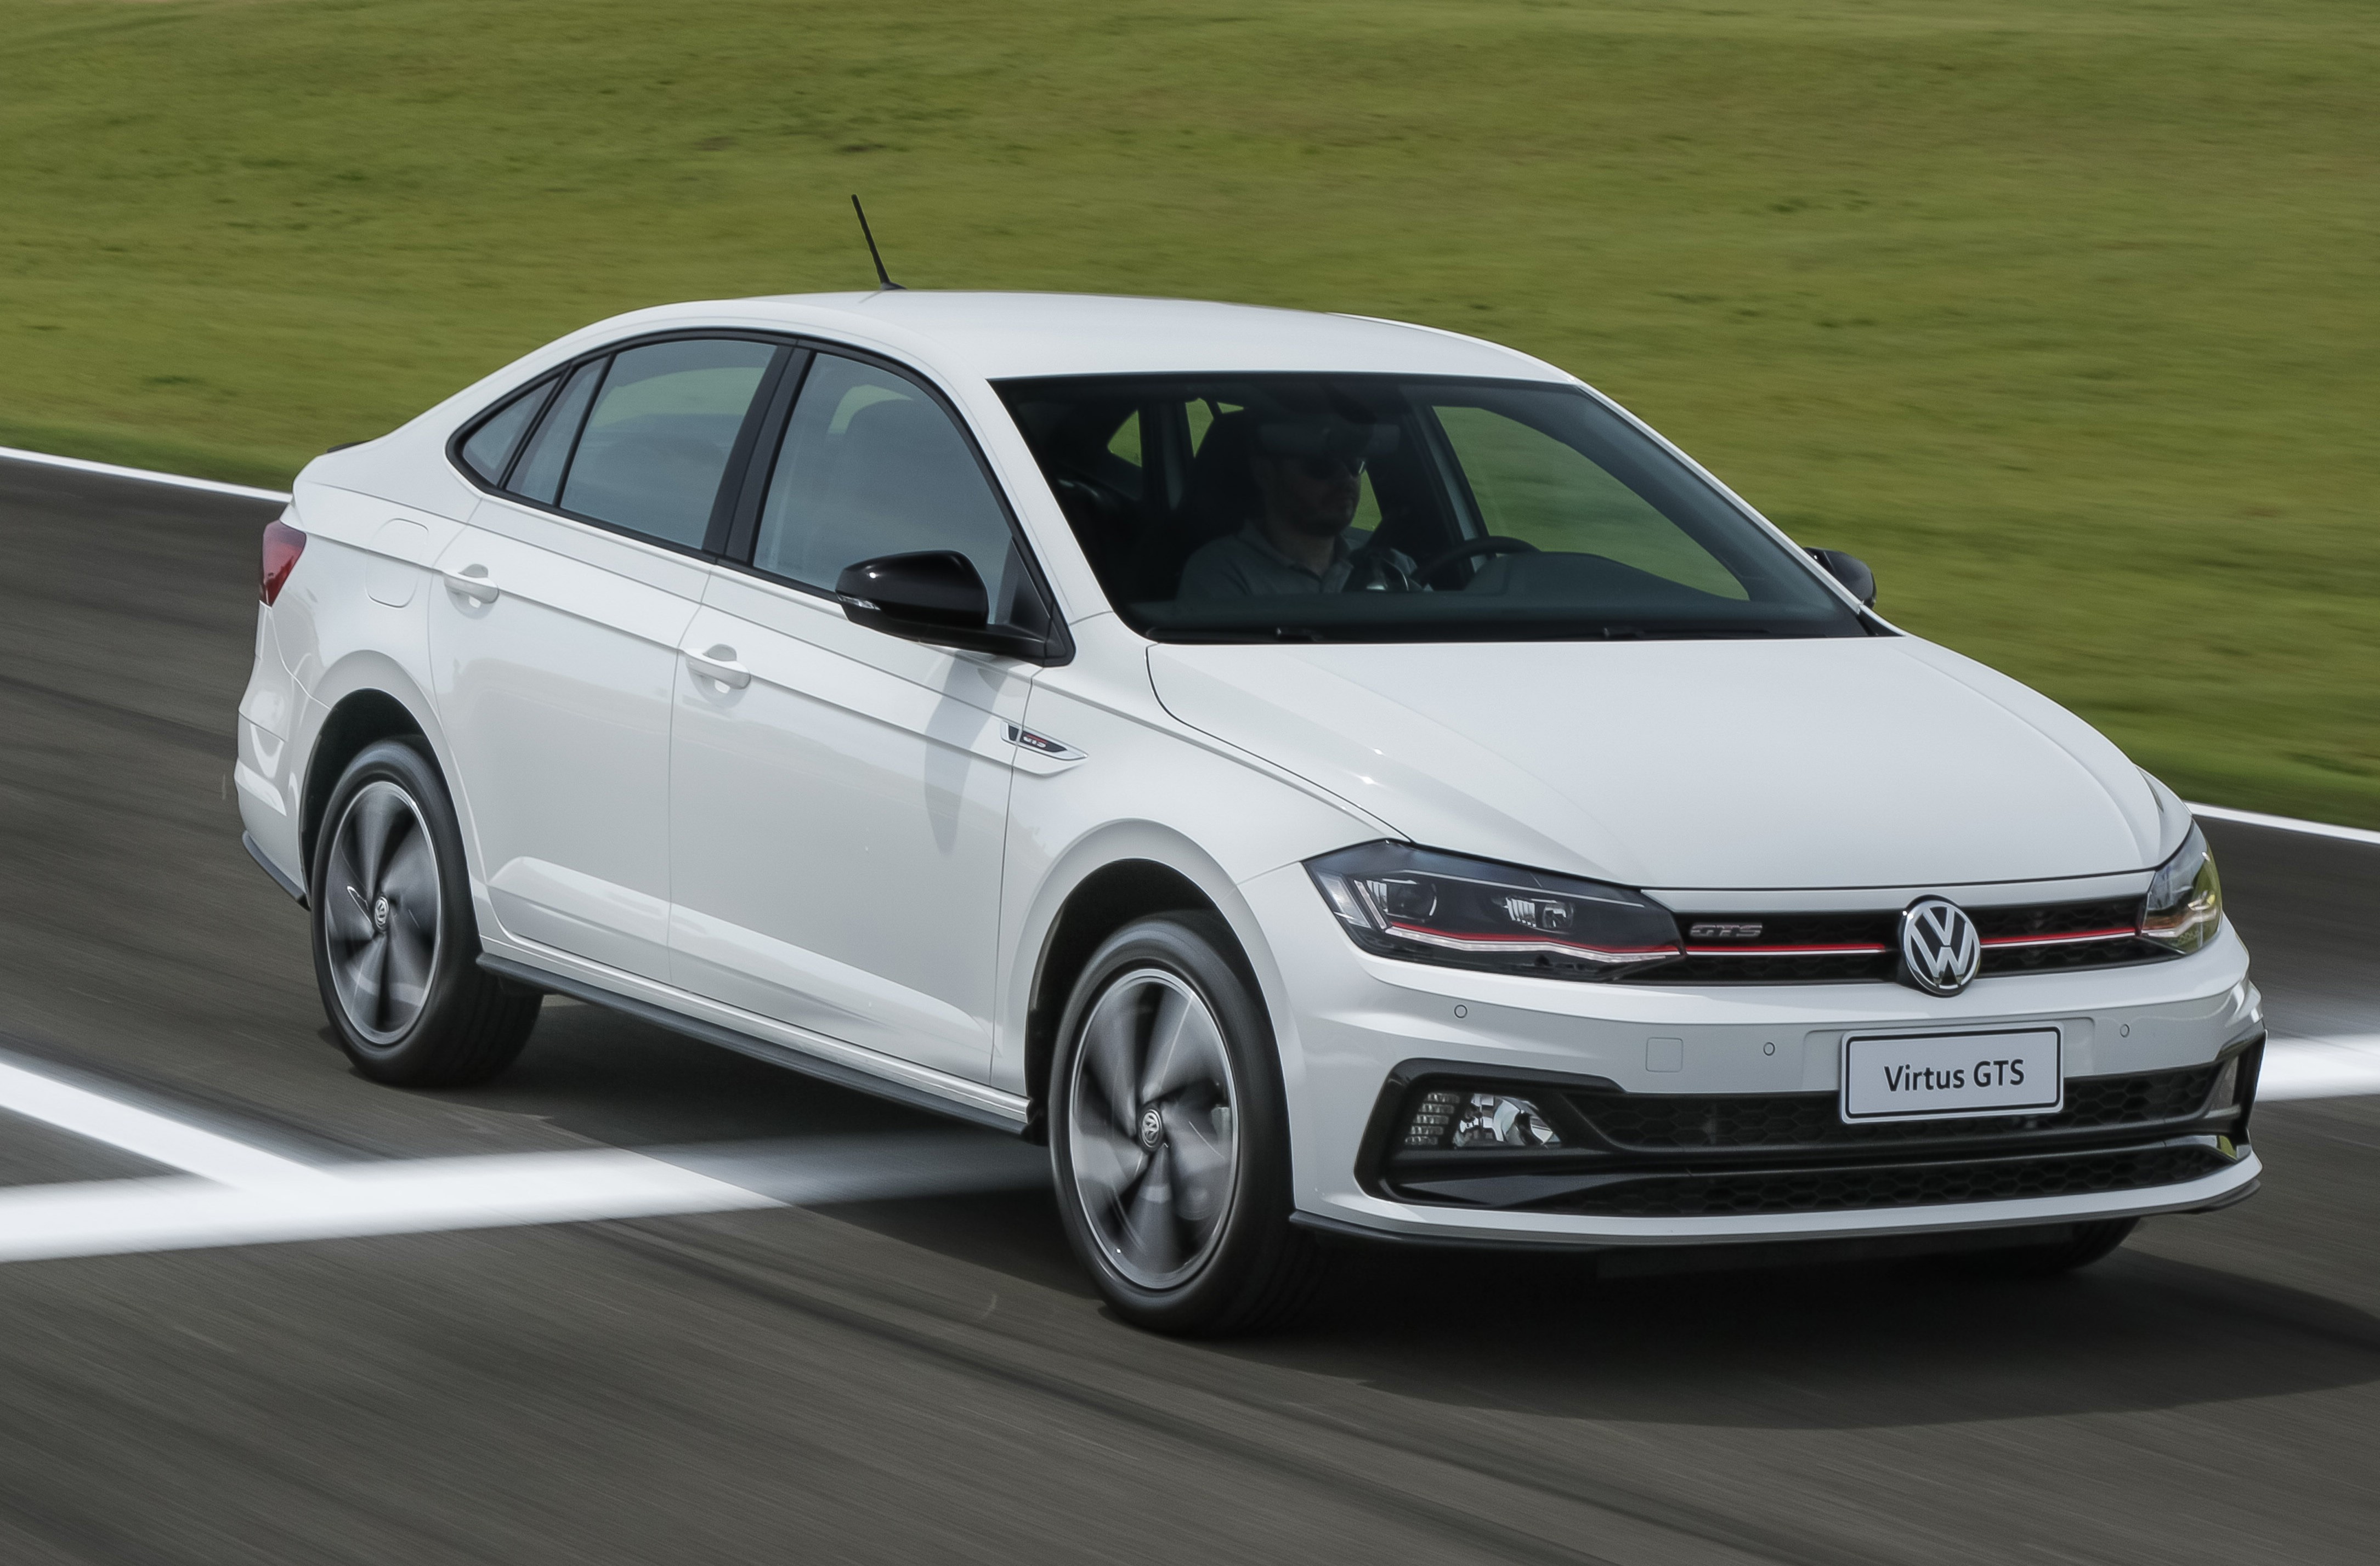 Volkswagen Virtus GTS chega a partir de R$ 104.940